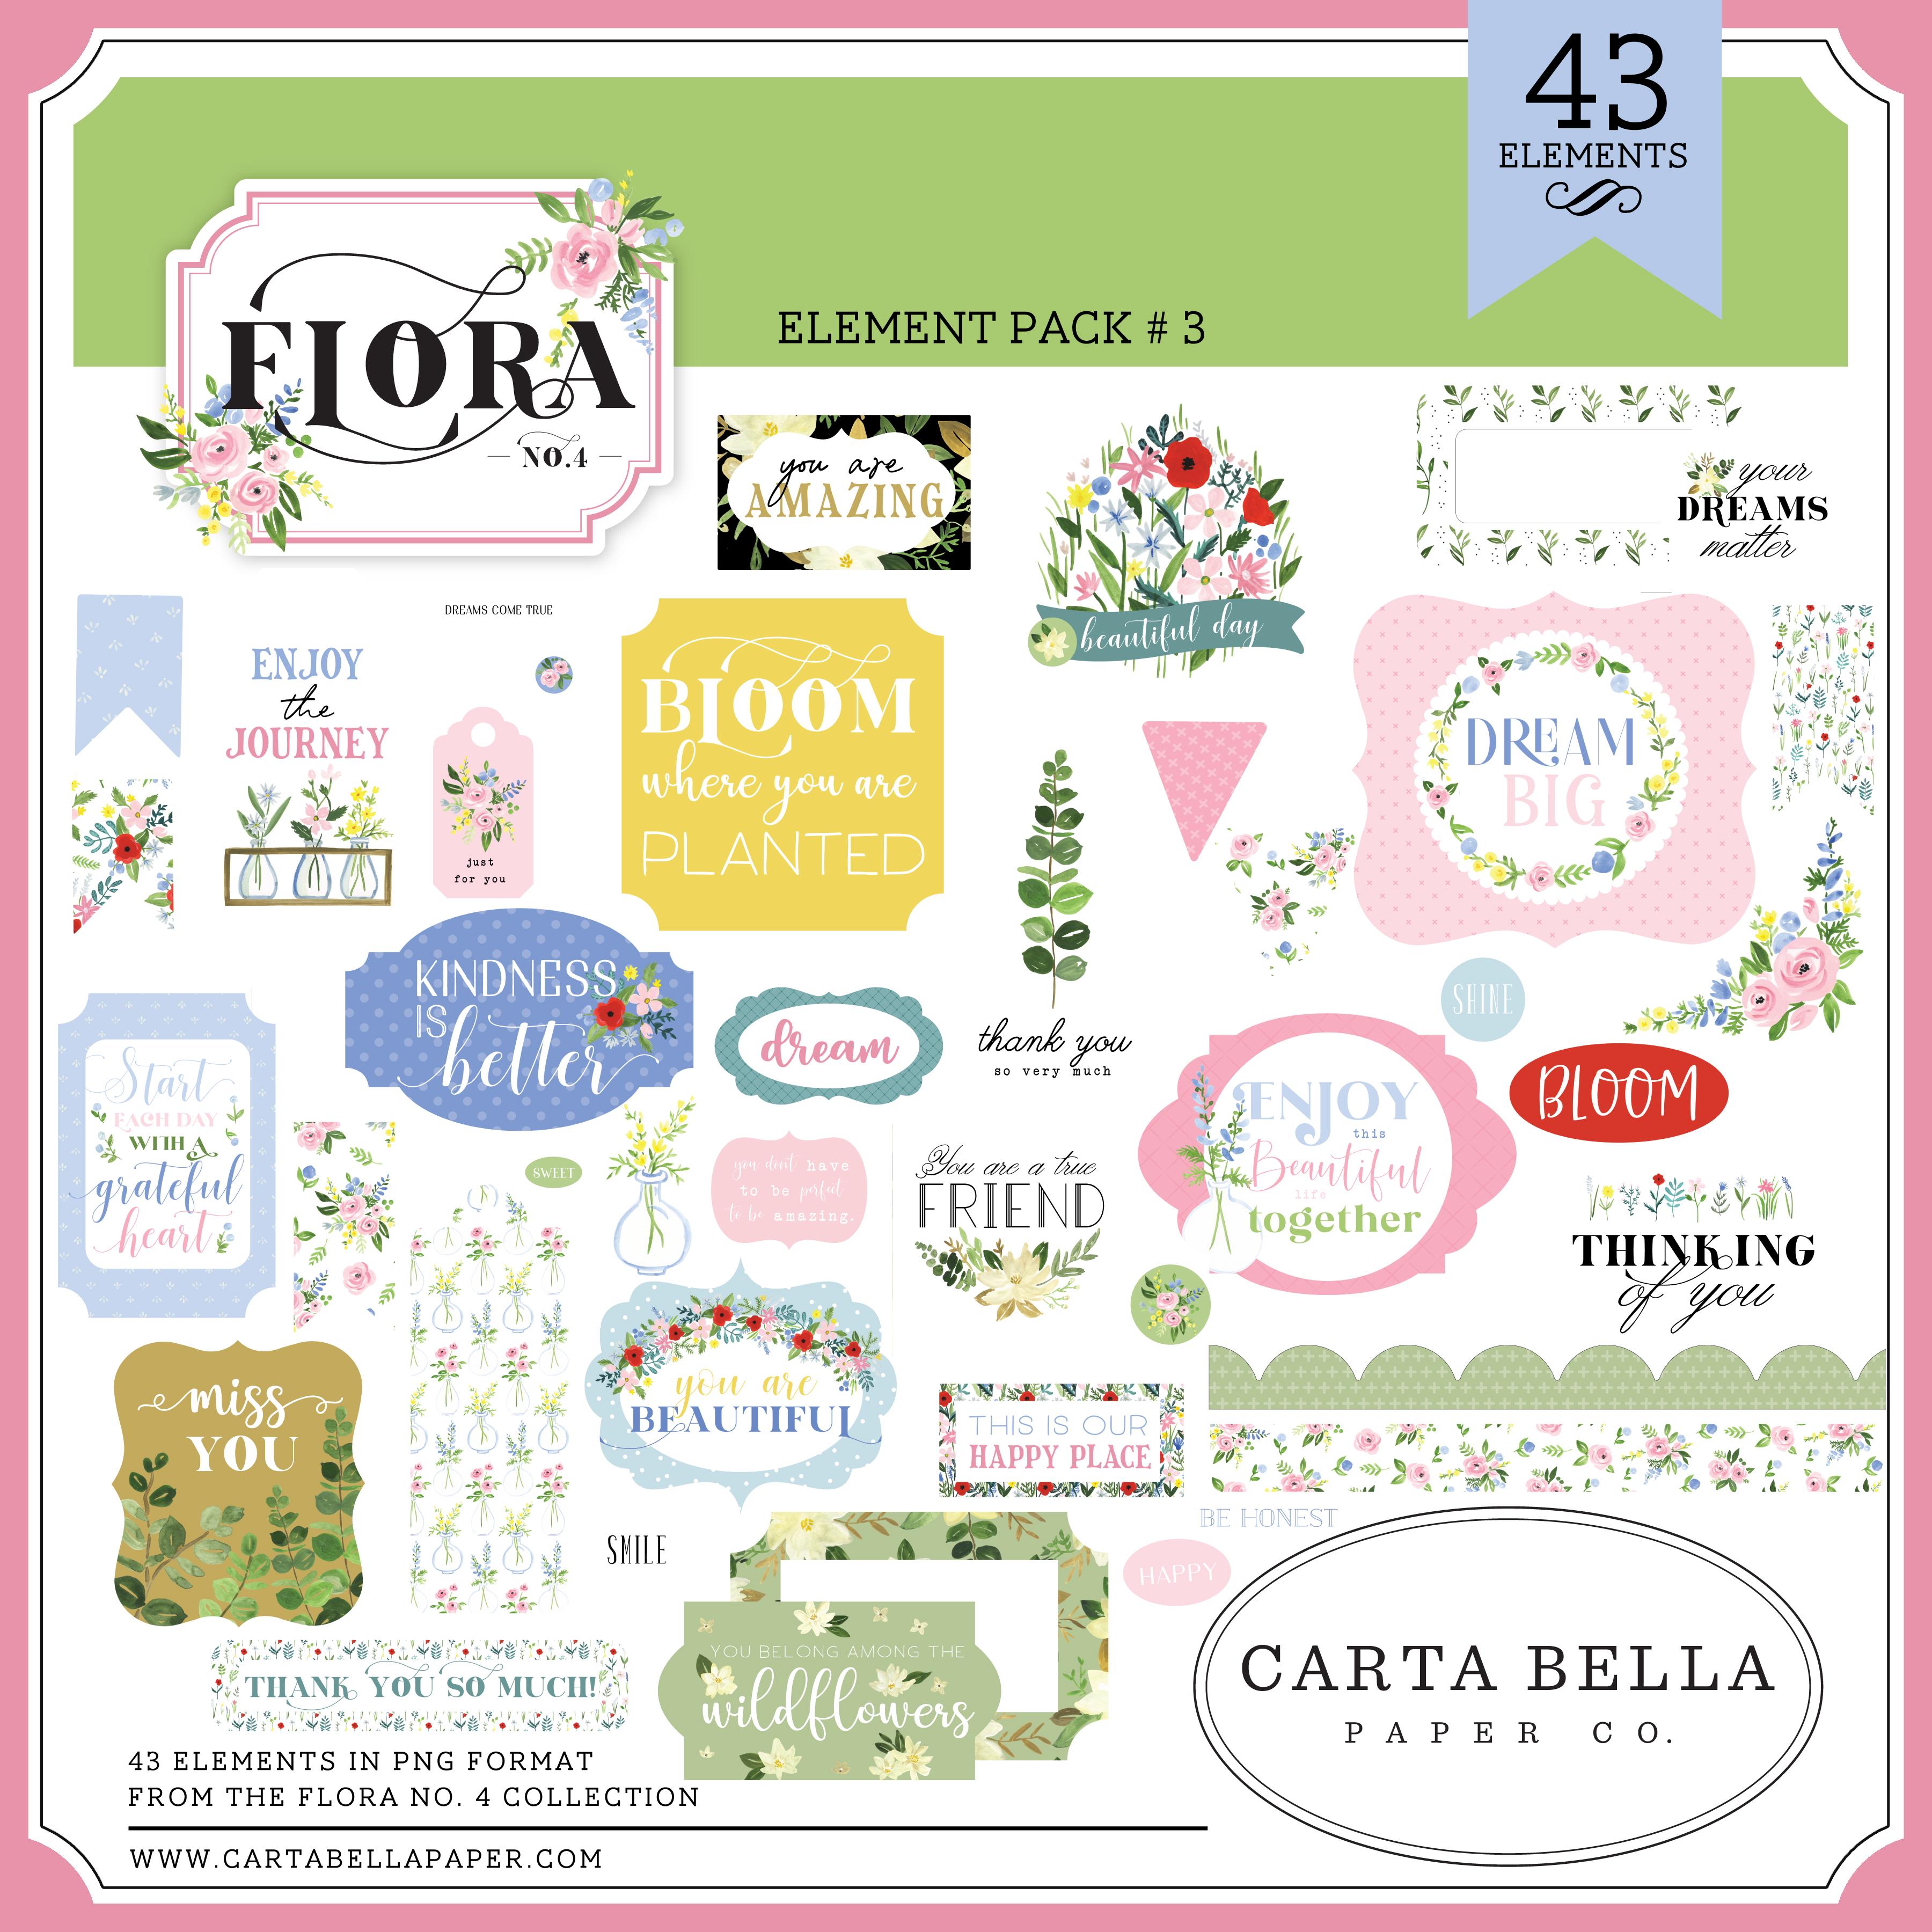 Flora No. 4 Element Pack #3